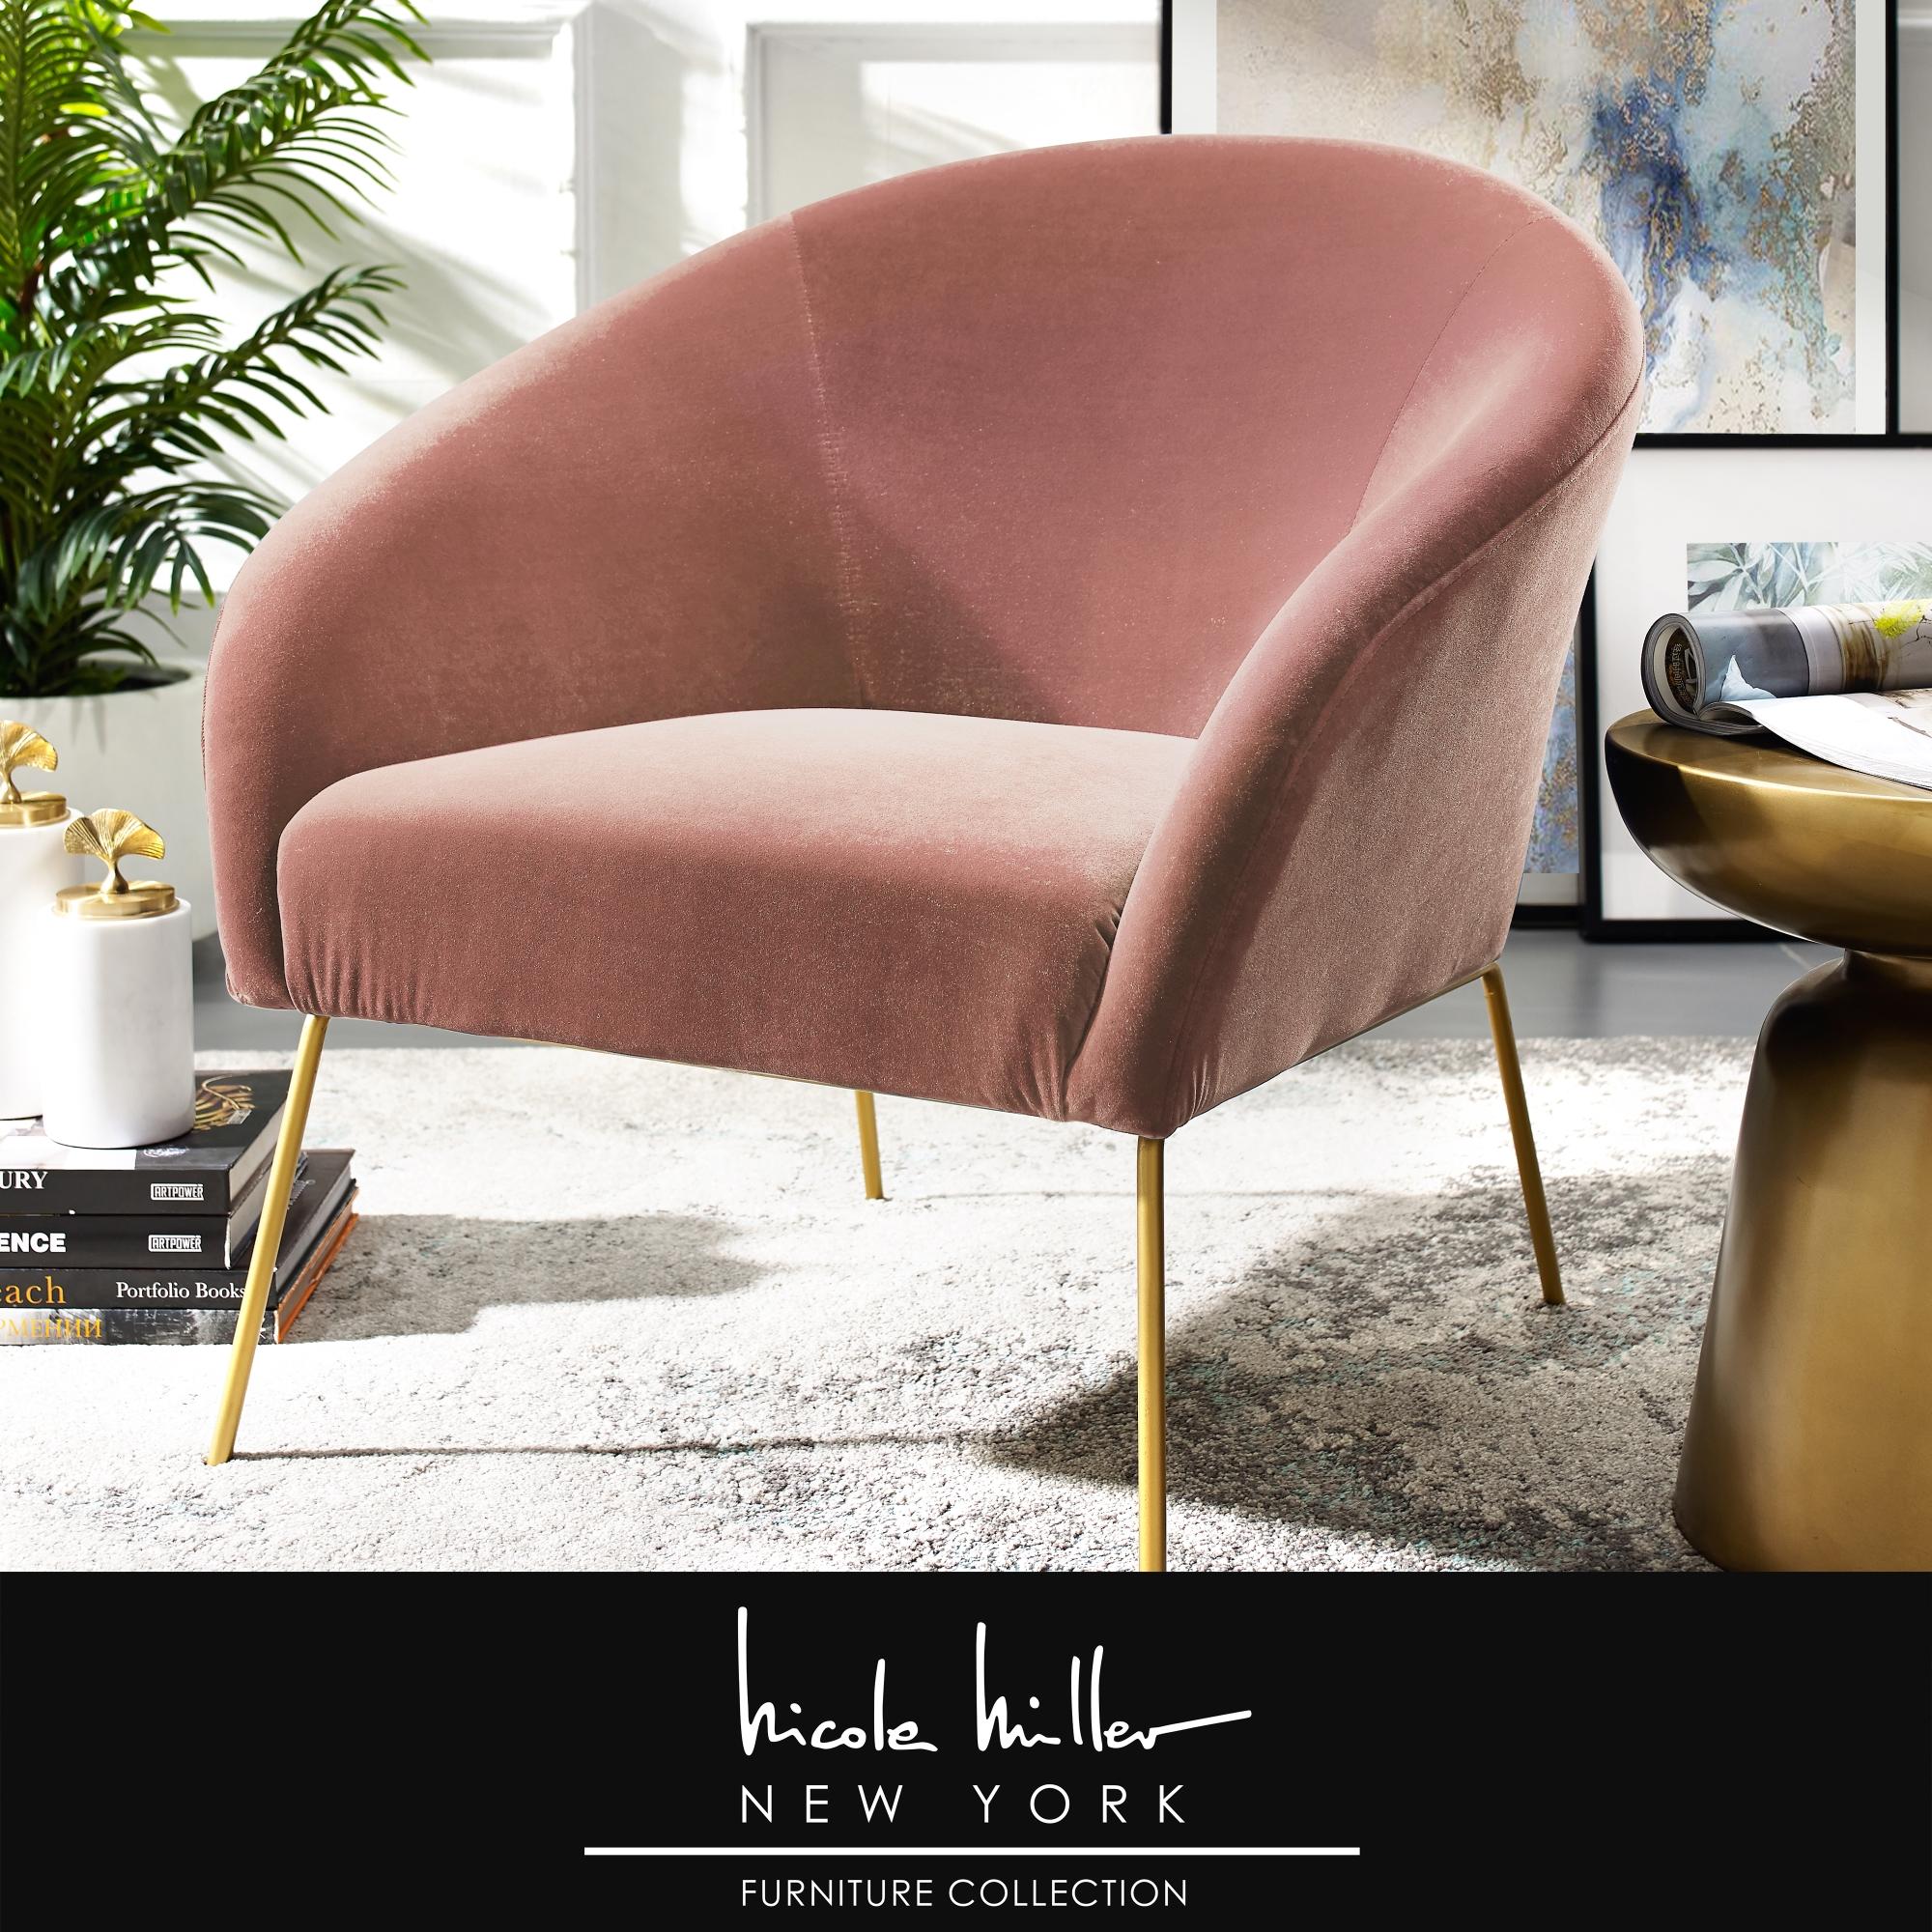 Nicole Miller Blush/Gold Velvet Accent Chair Armless Gold Matte Base